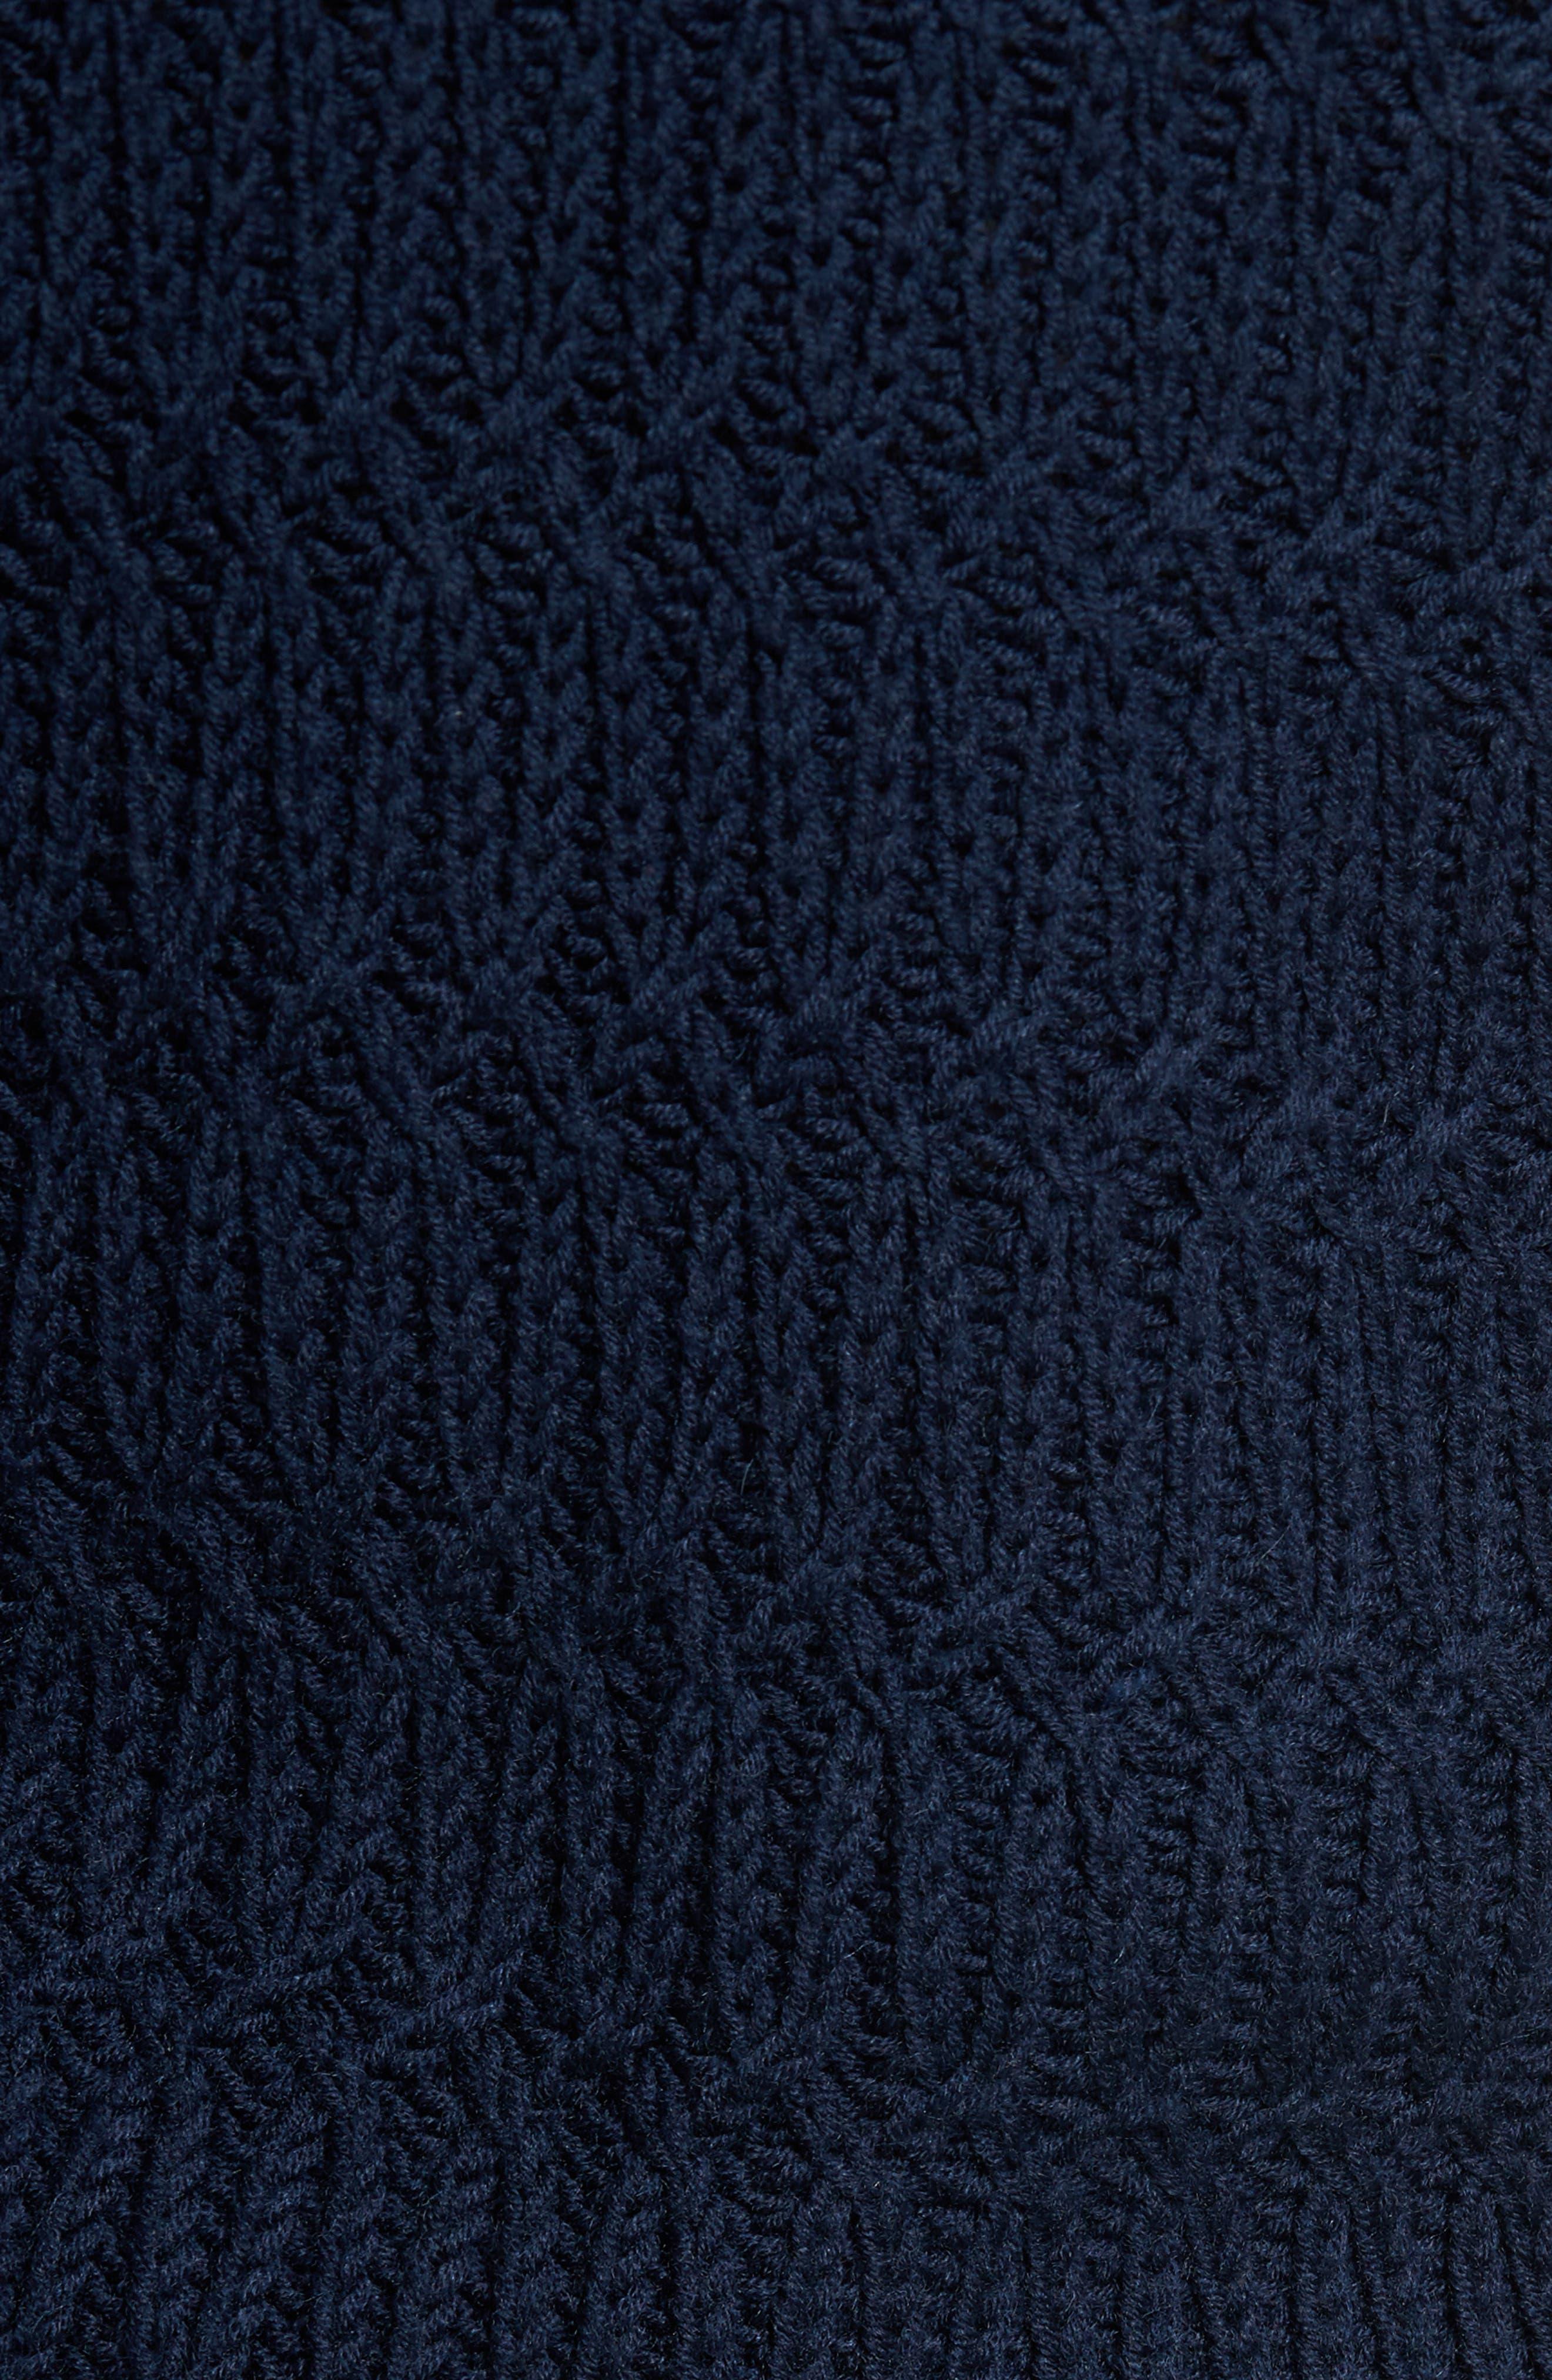 Chunky Turtleneck Sweater,                             Alternate thumbnail 7, color,                             Navy Iris